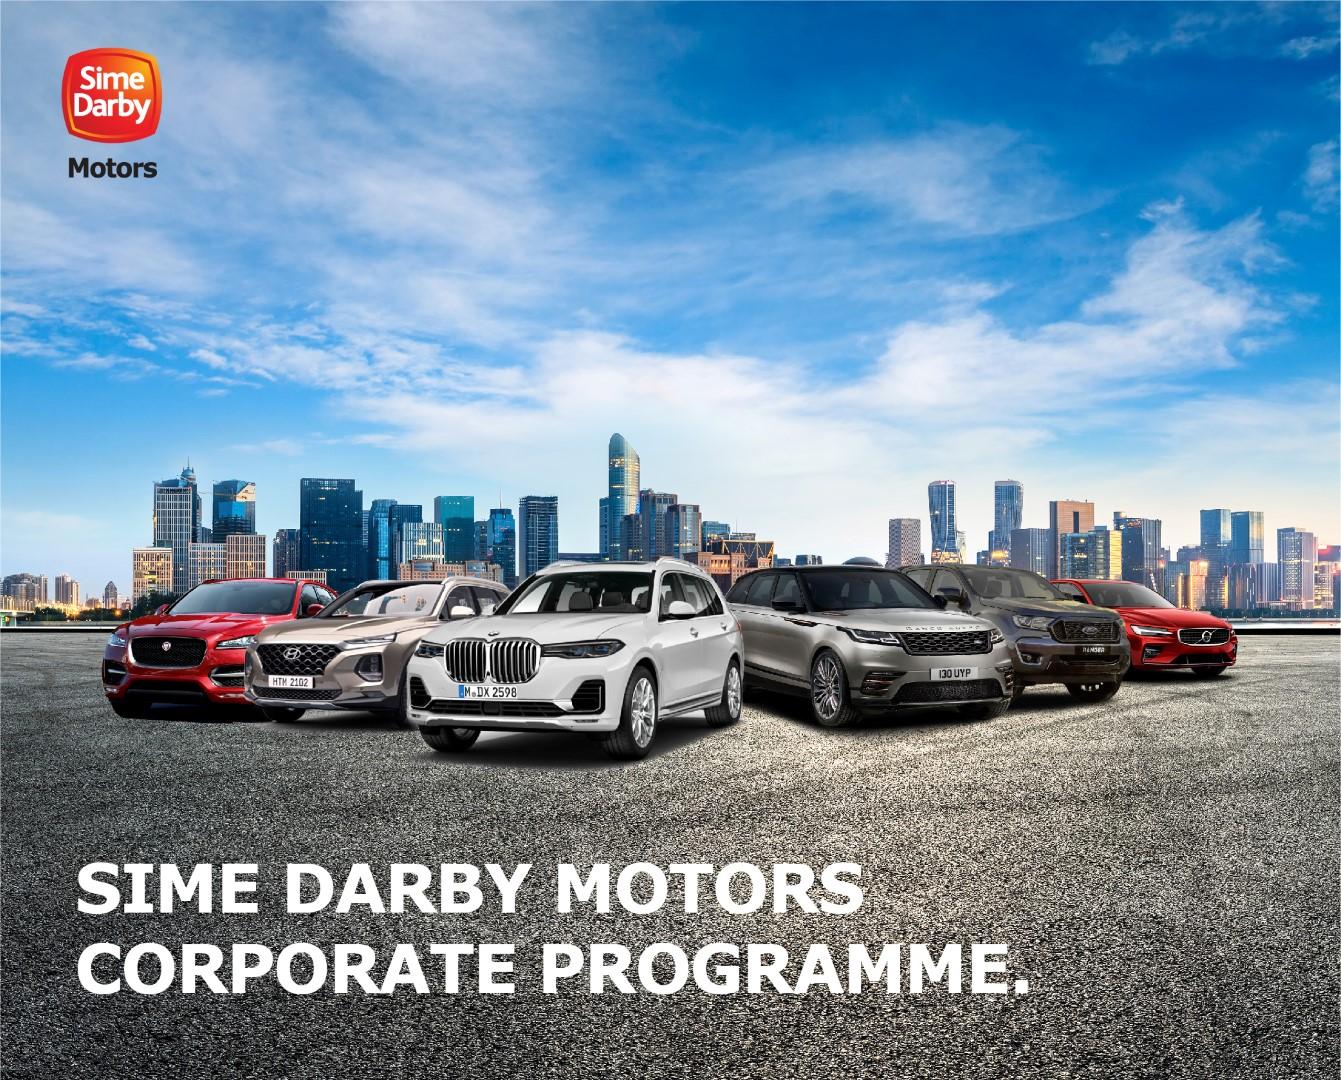 Sime Darby Motors Corporation